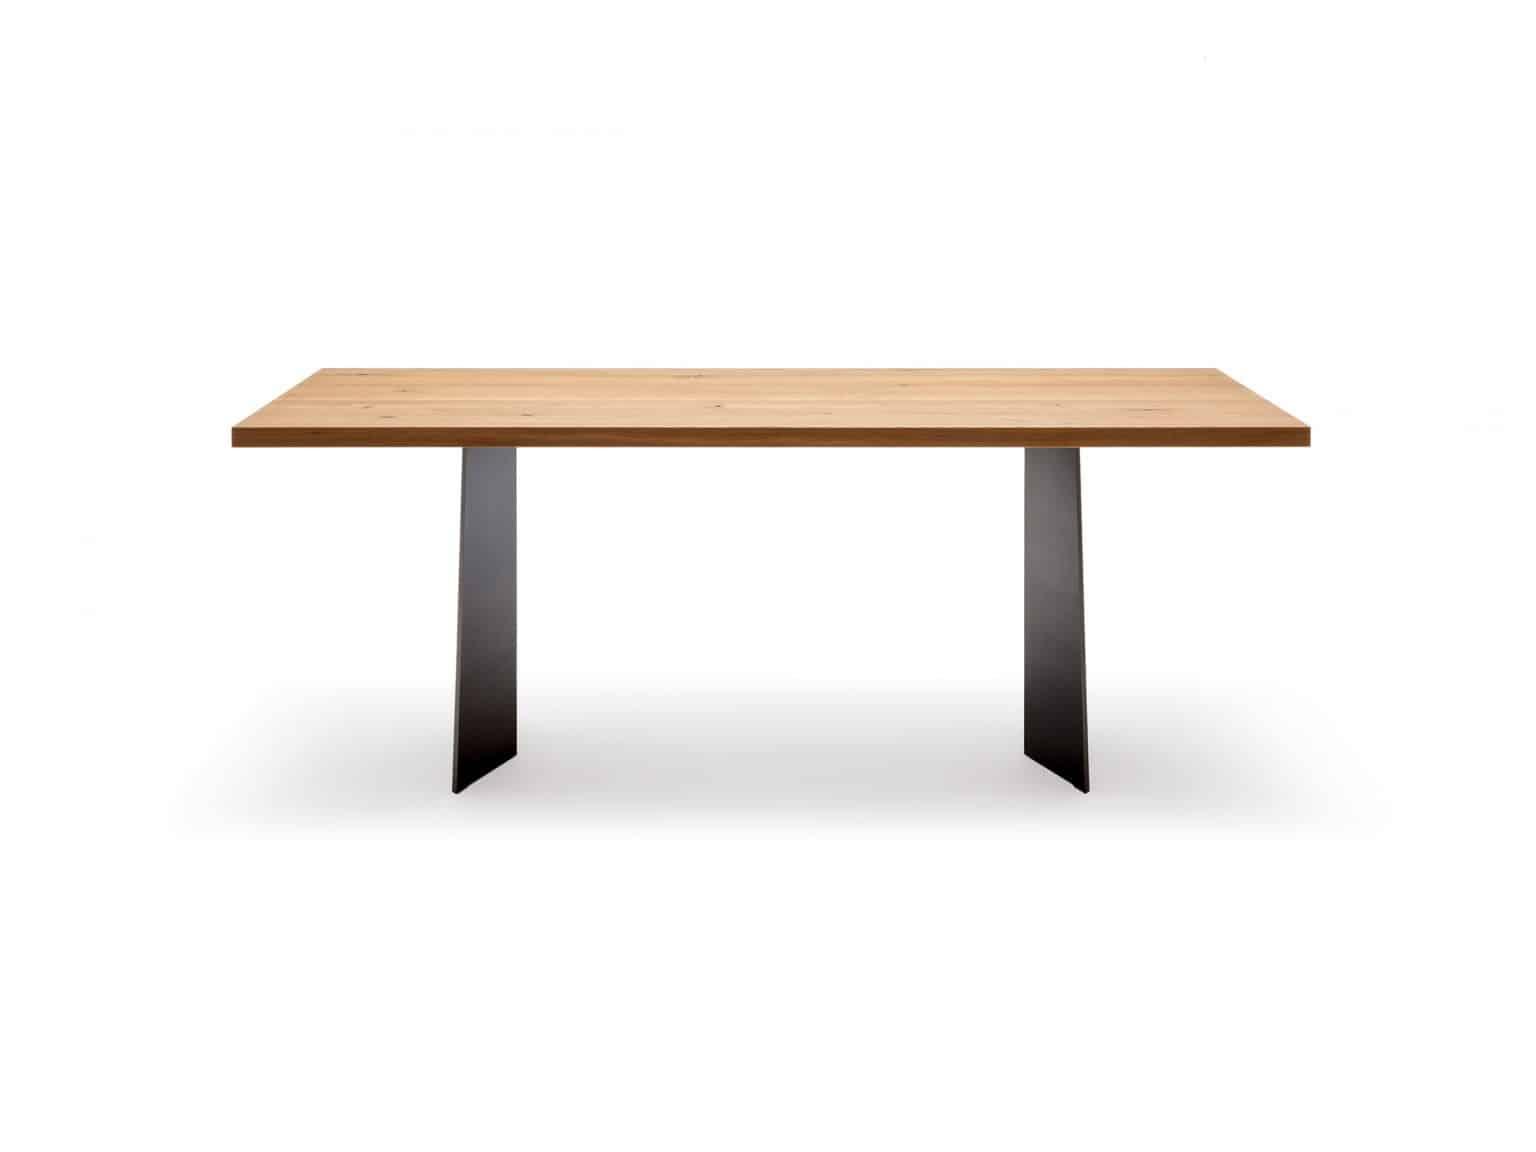 Rolf benz tafel 969 pa